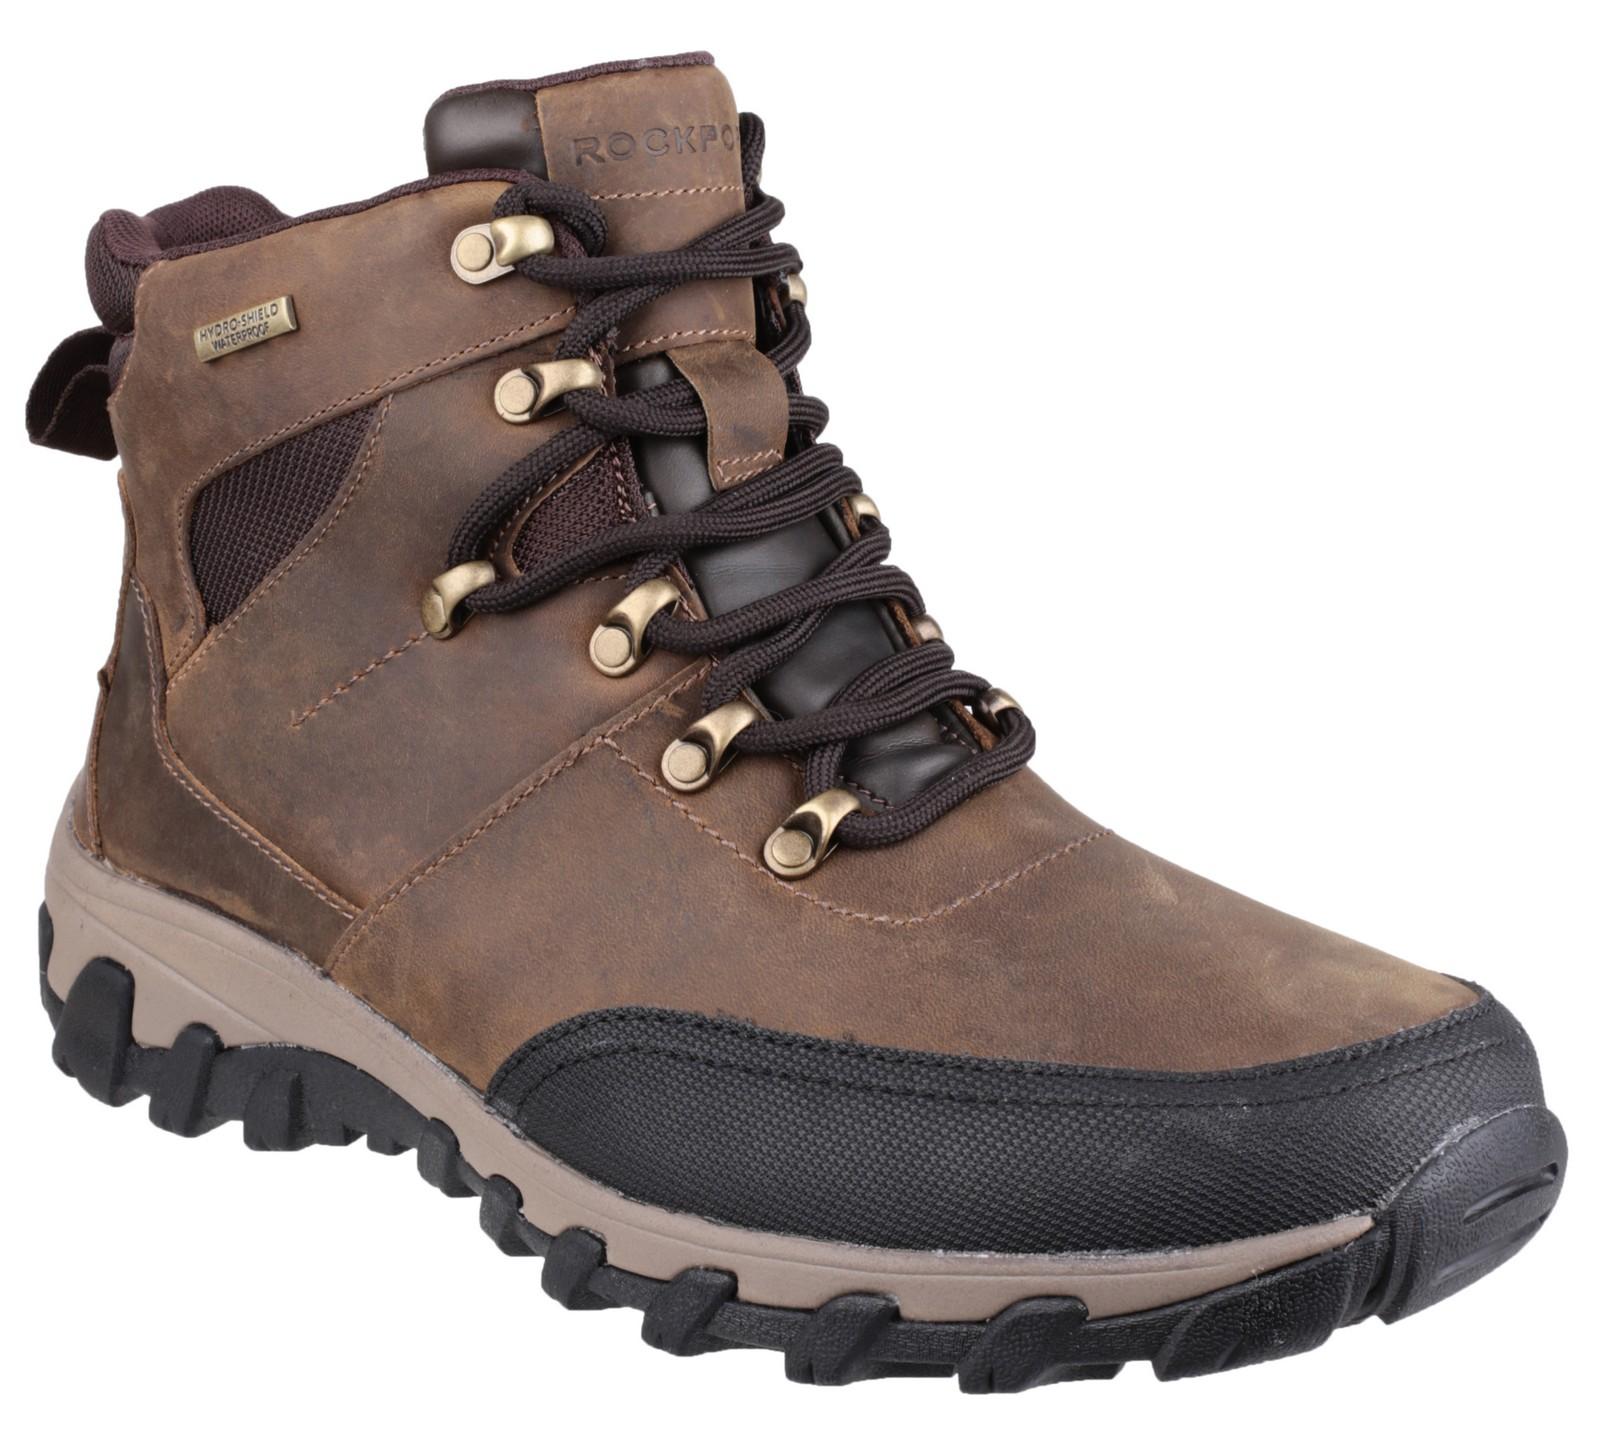 Rockport-Csp-Springs-Laessig-Mens-Boot